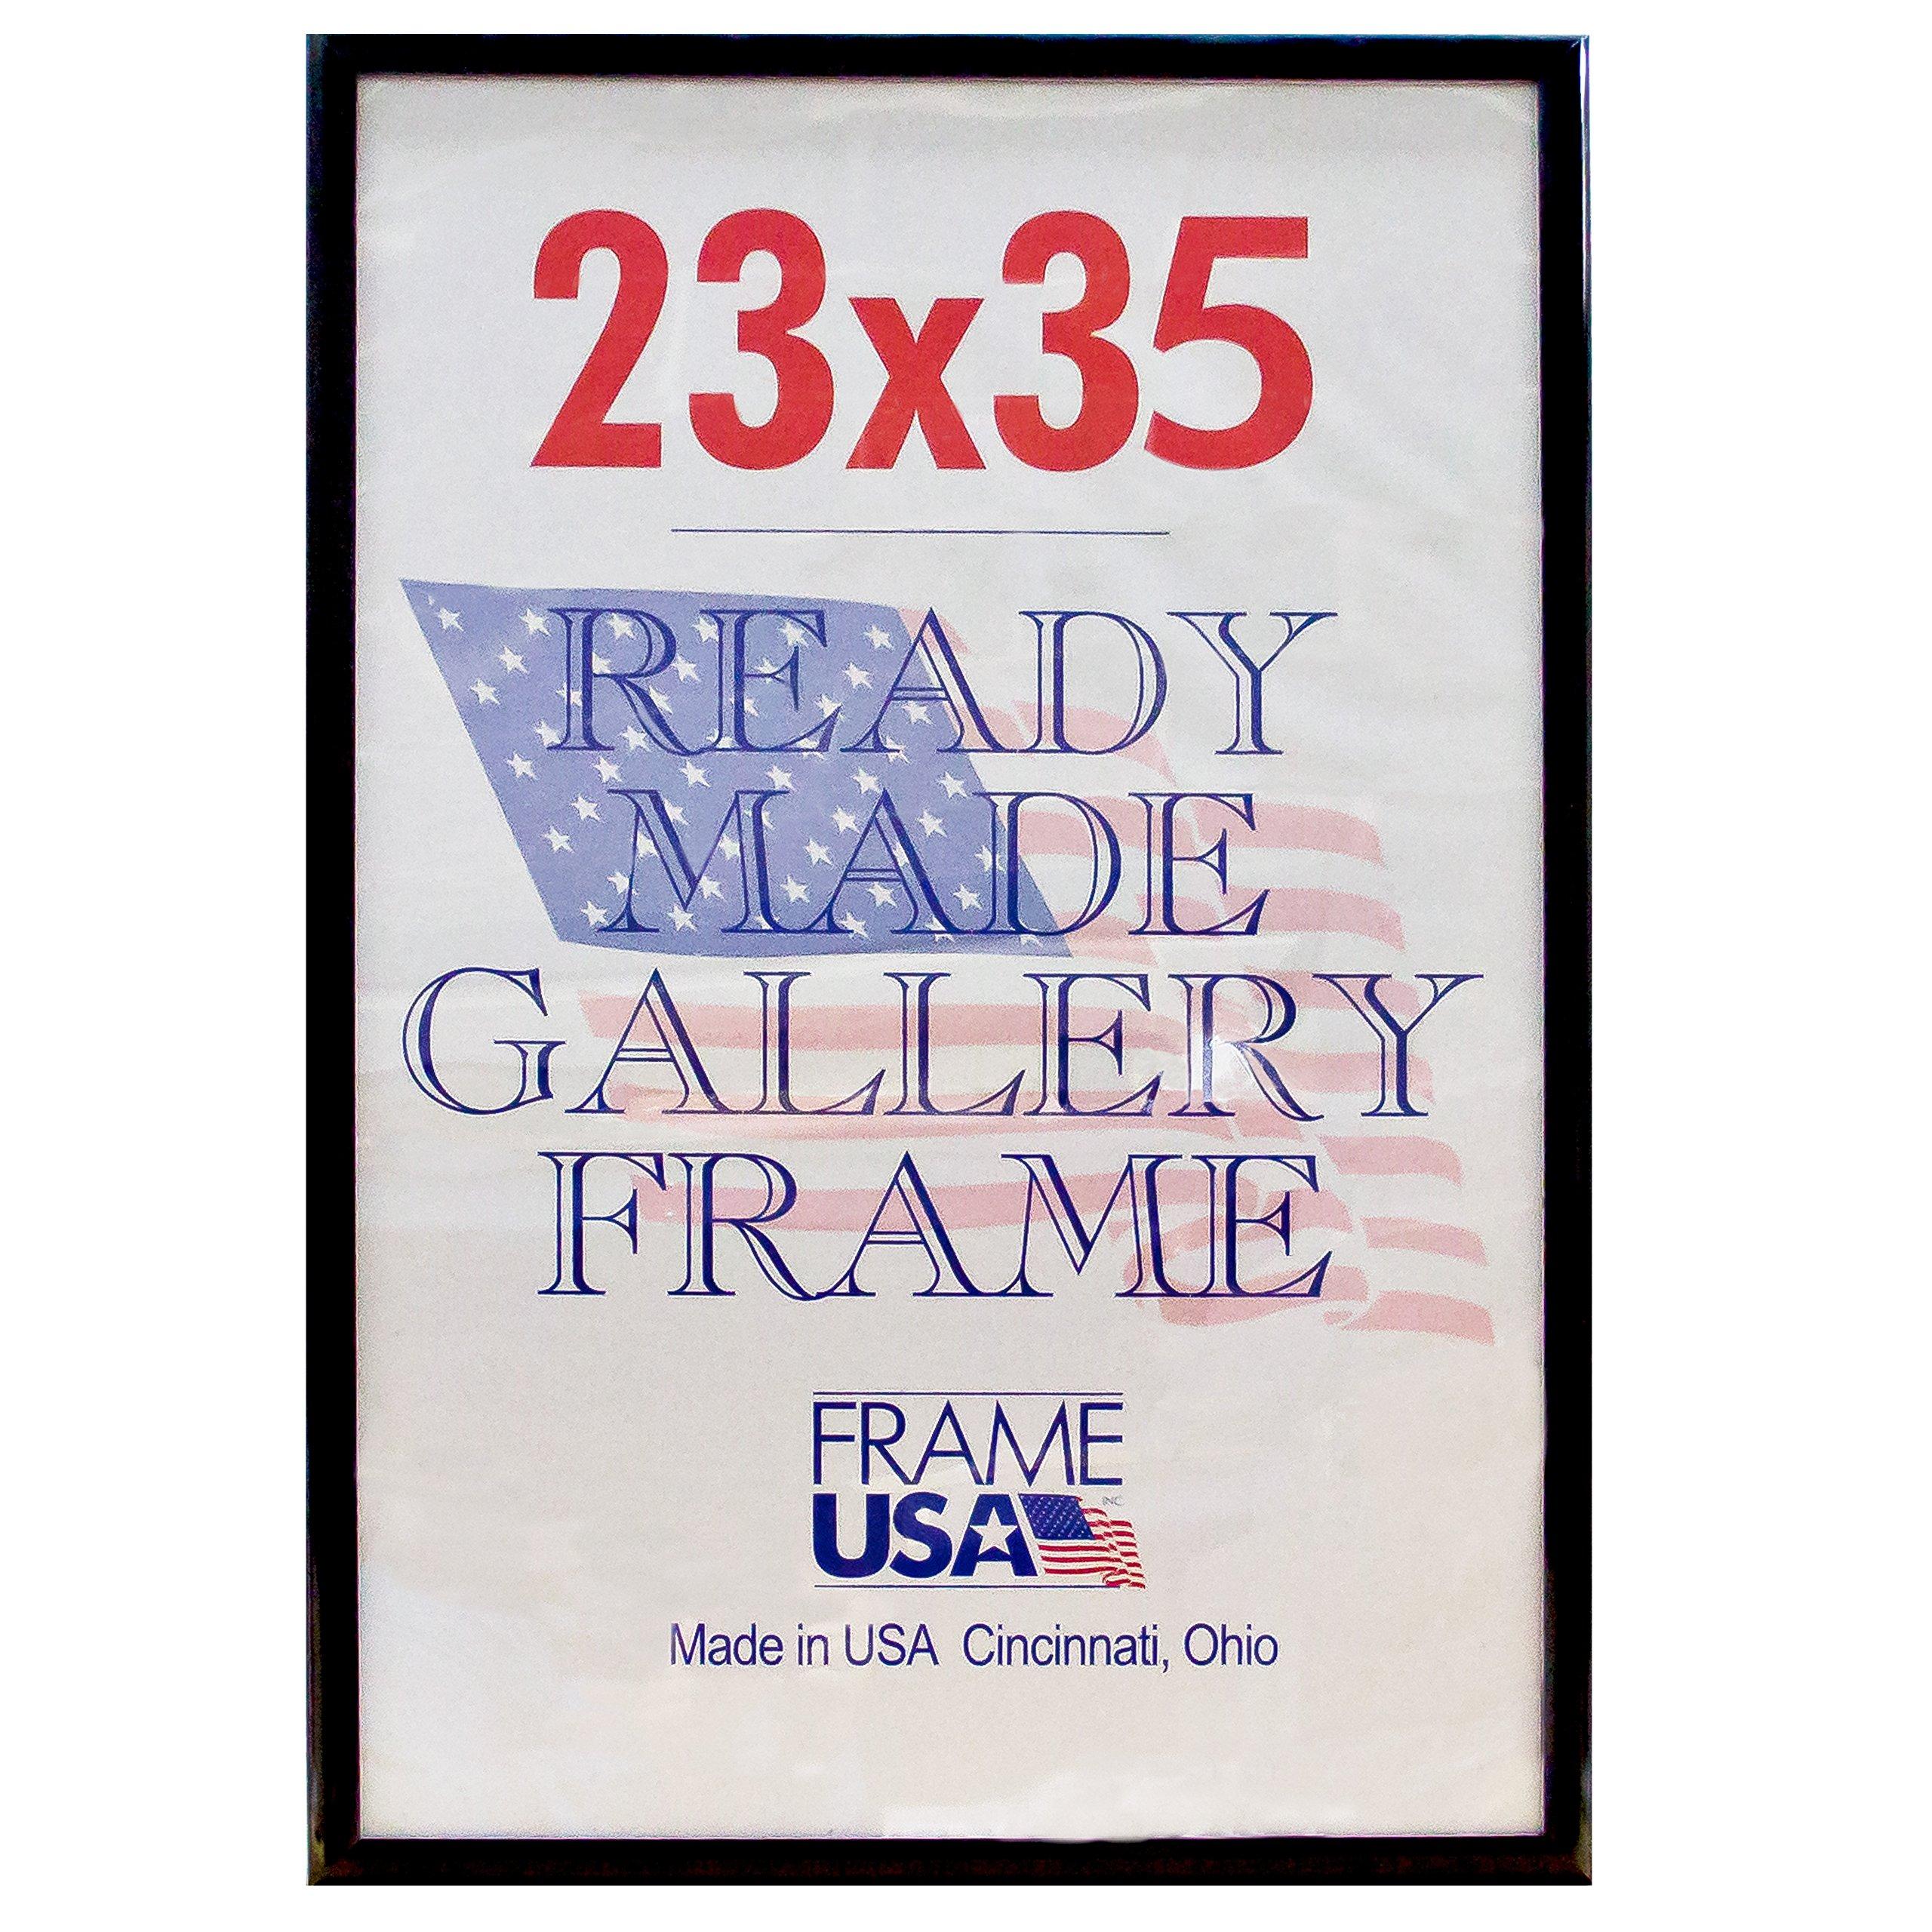 Deluxe Posterframe Frames, 23 x 35, Black